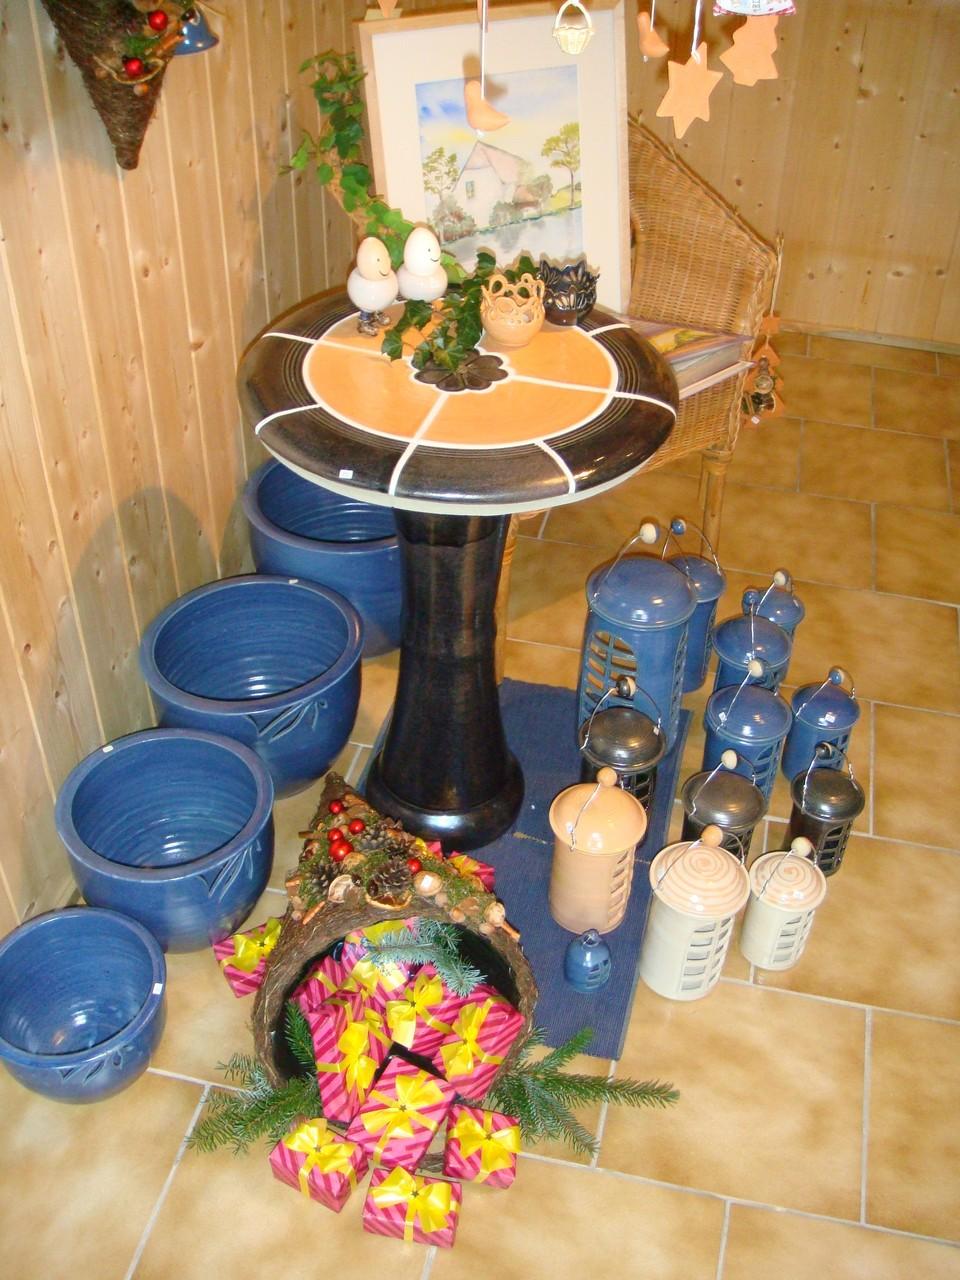 Keramiktisch